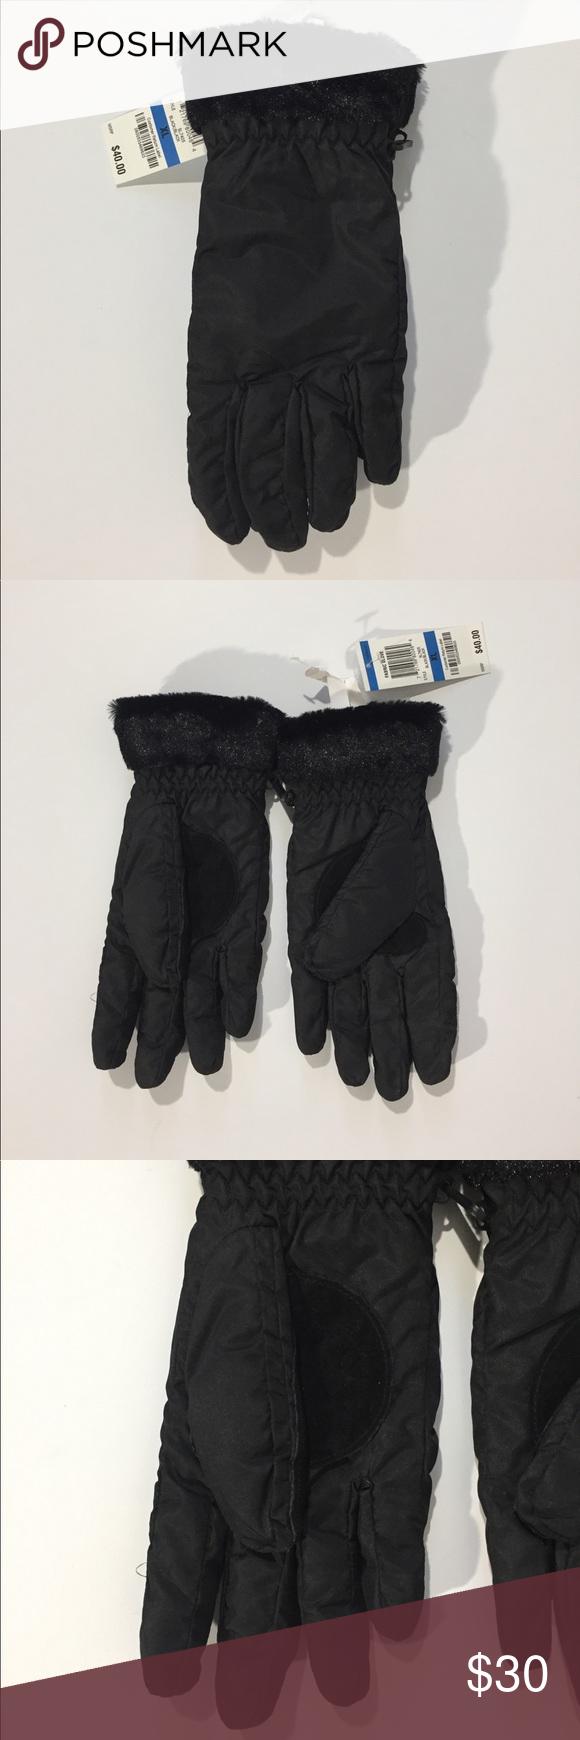 NWT Charter Club Black Fabric Gloves NWT Clothes design